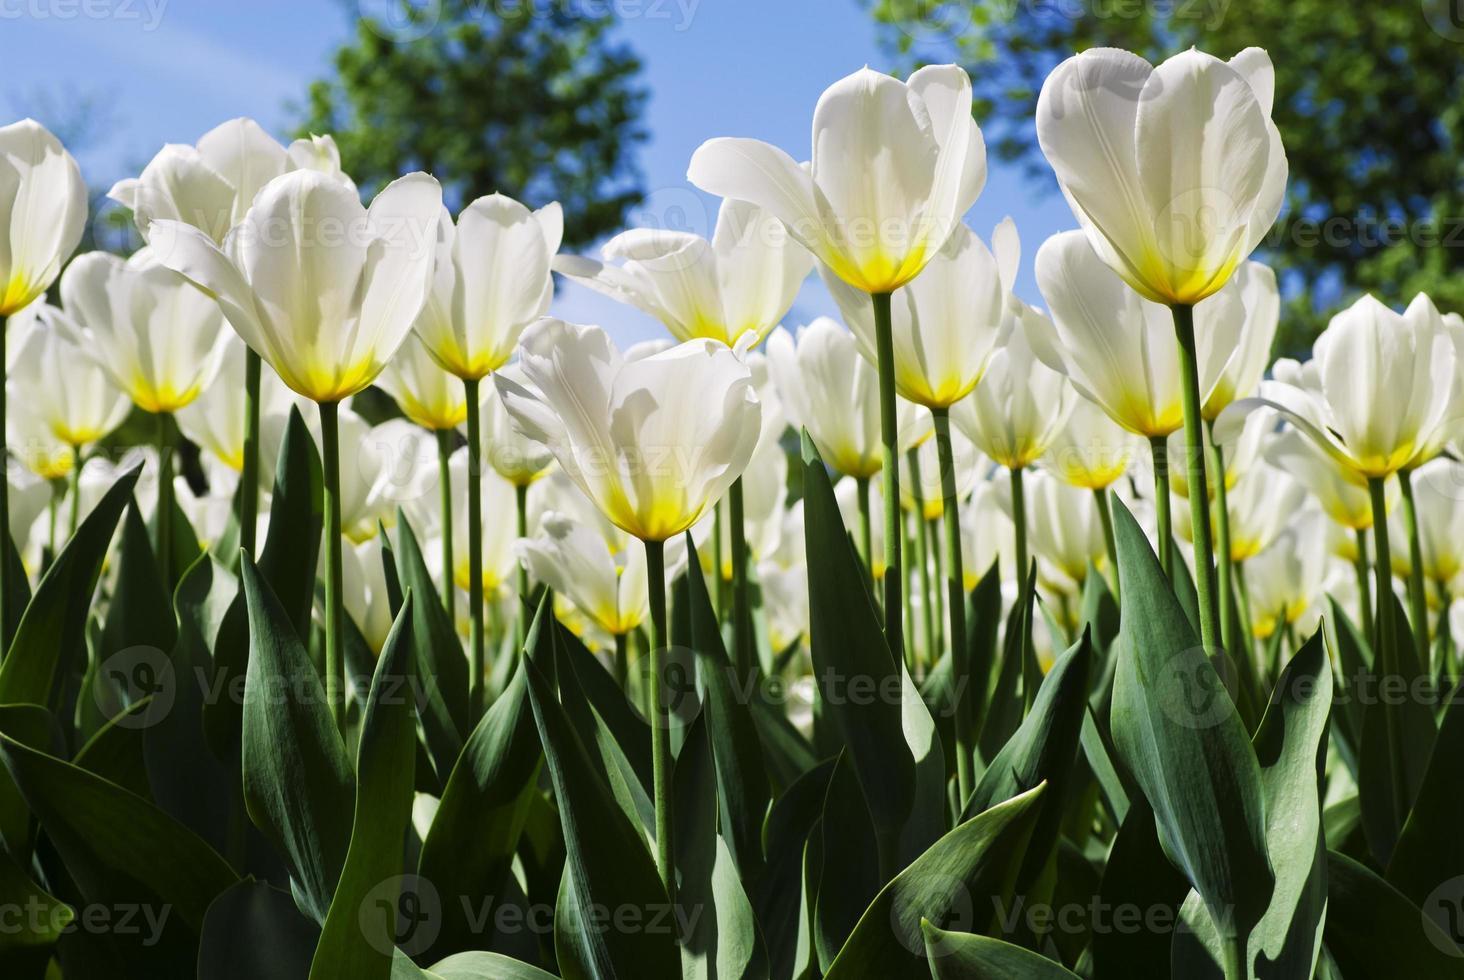 fundo de primavera com lindas tulipas brancas foto